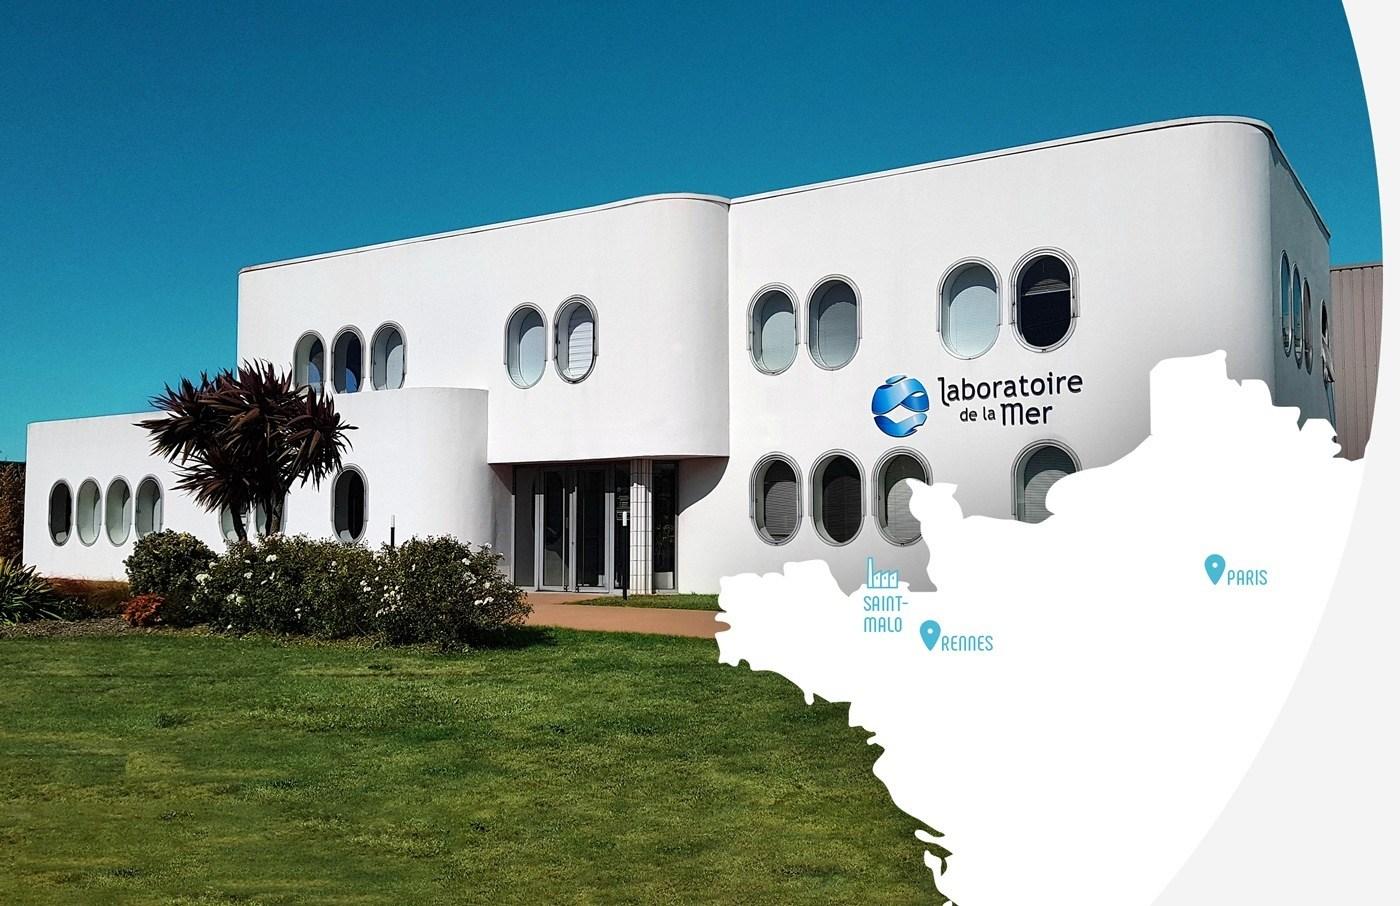 Laboratoire De La Mer Healthcare Products With Marine Active Ingredients